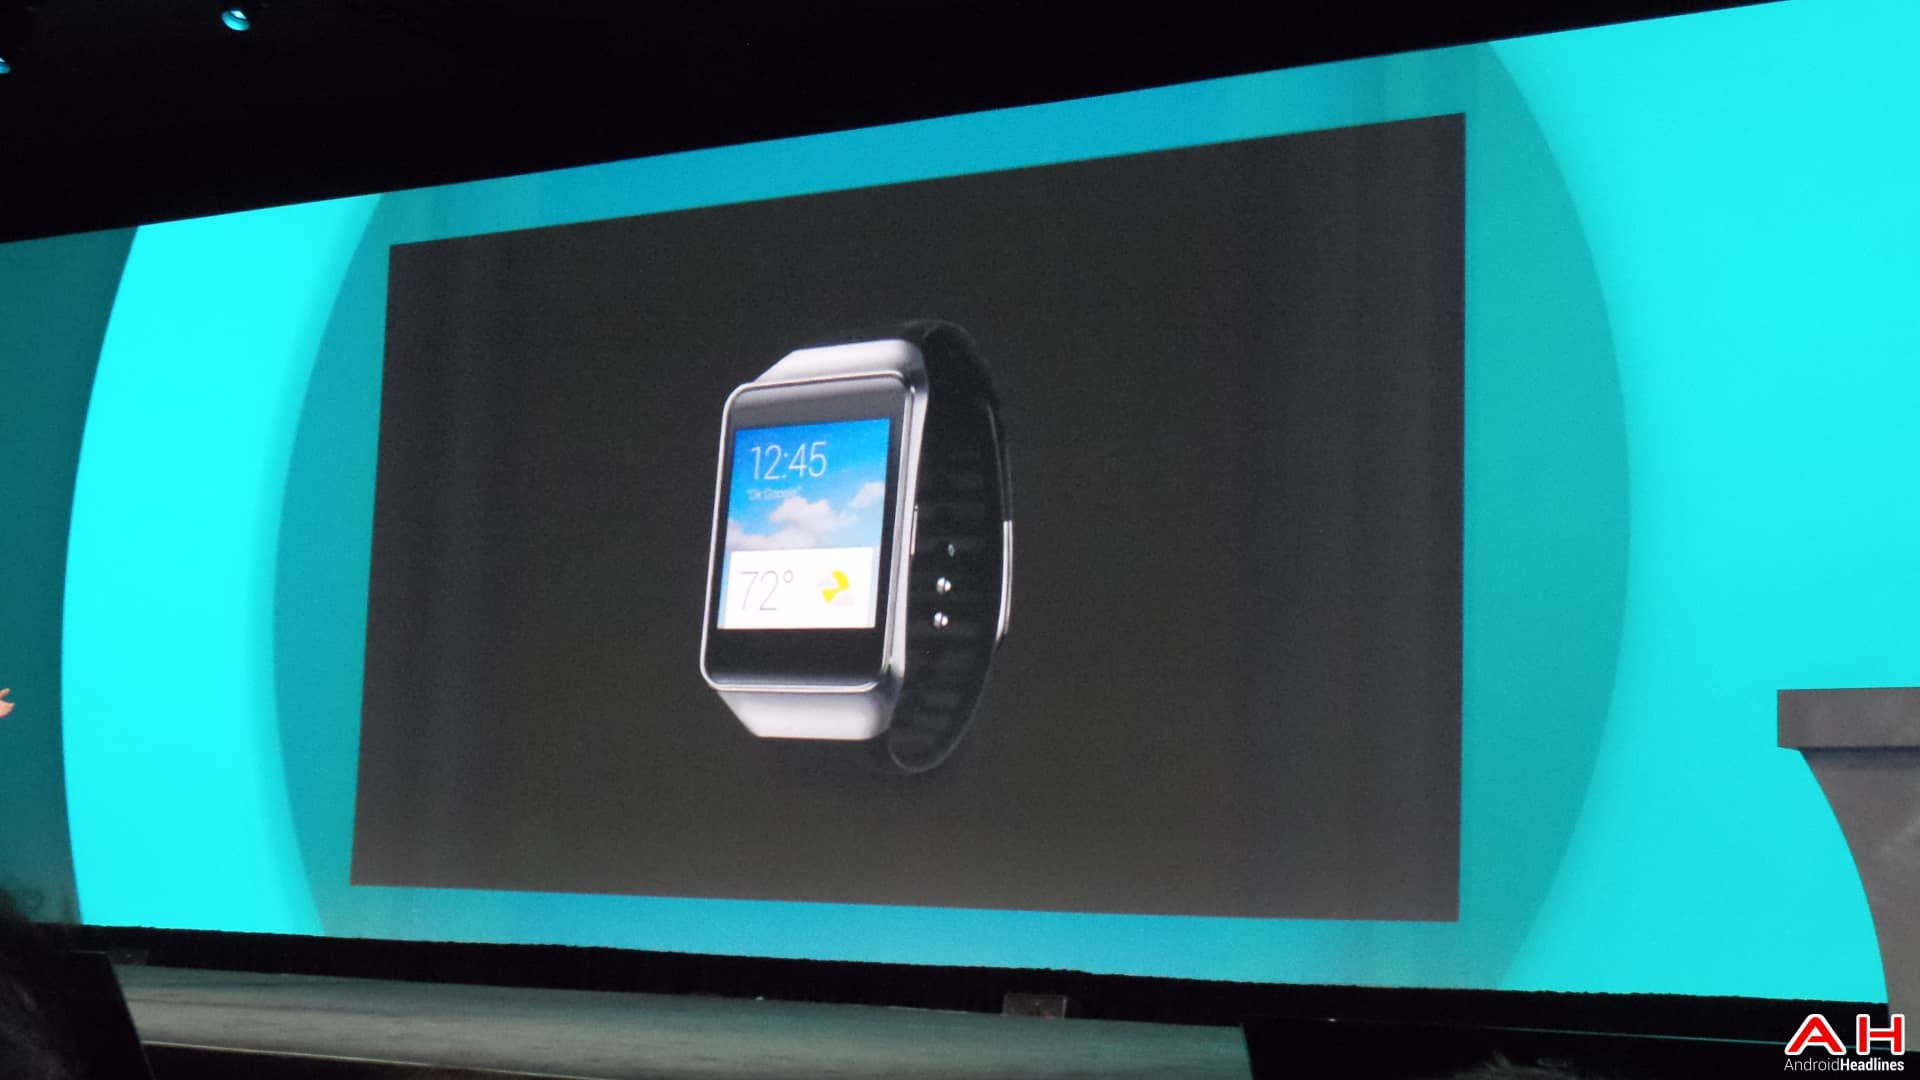 AH Google IO 2014 308 of 18 Android Wear Samsung